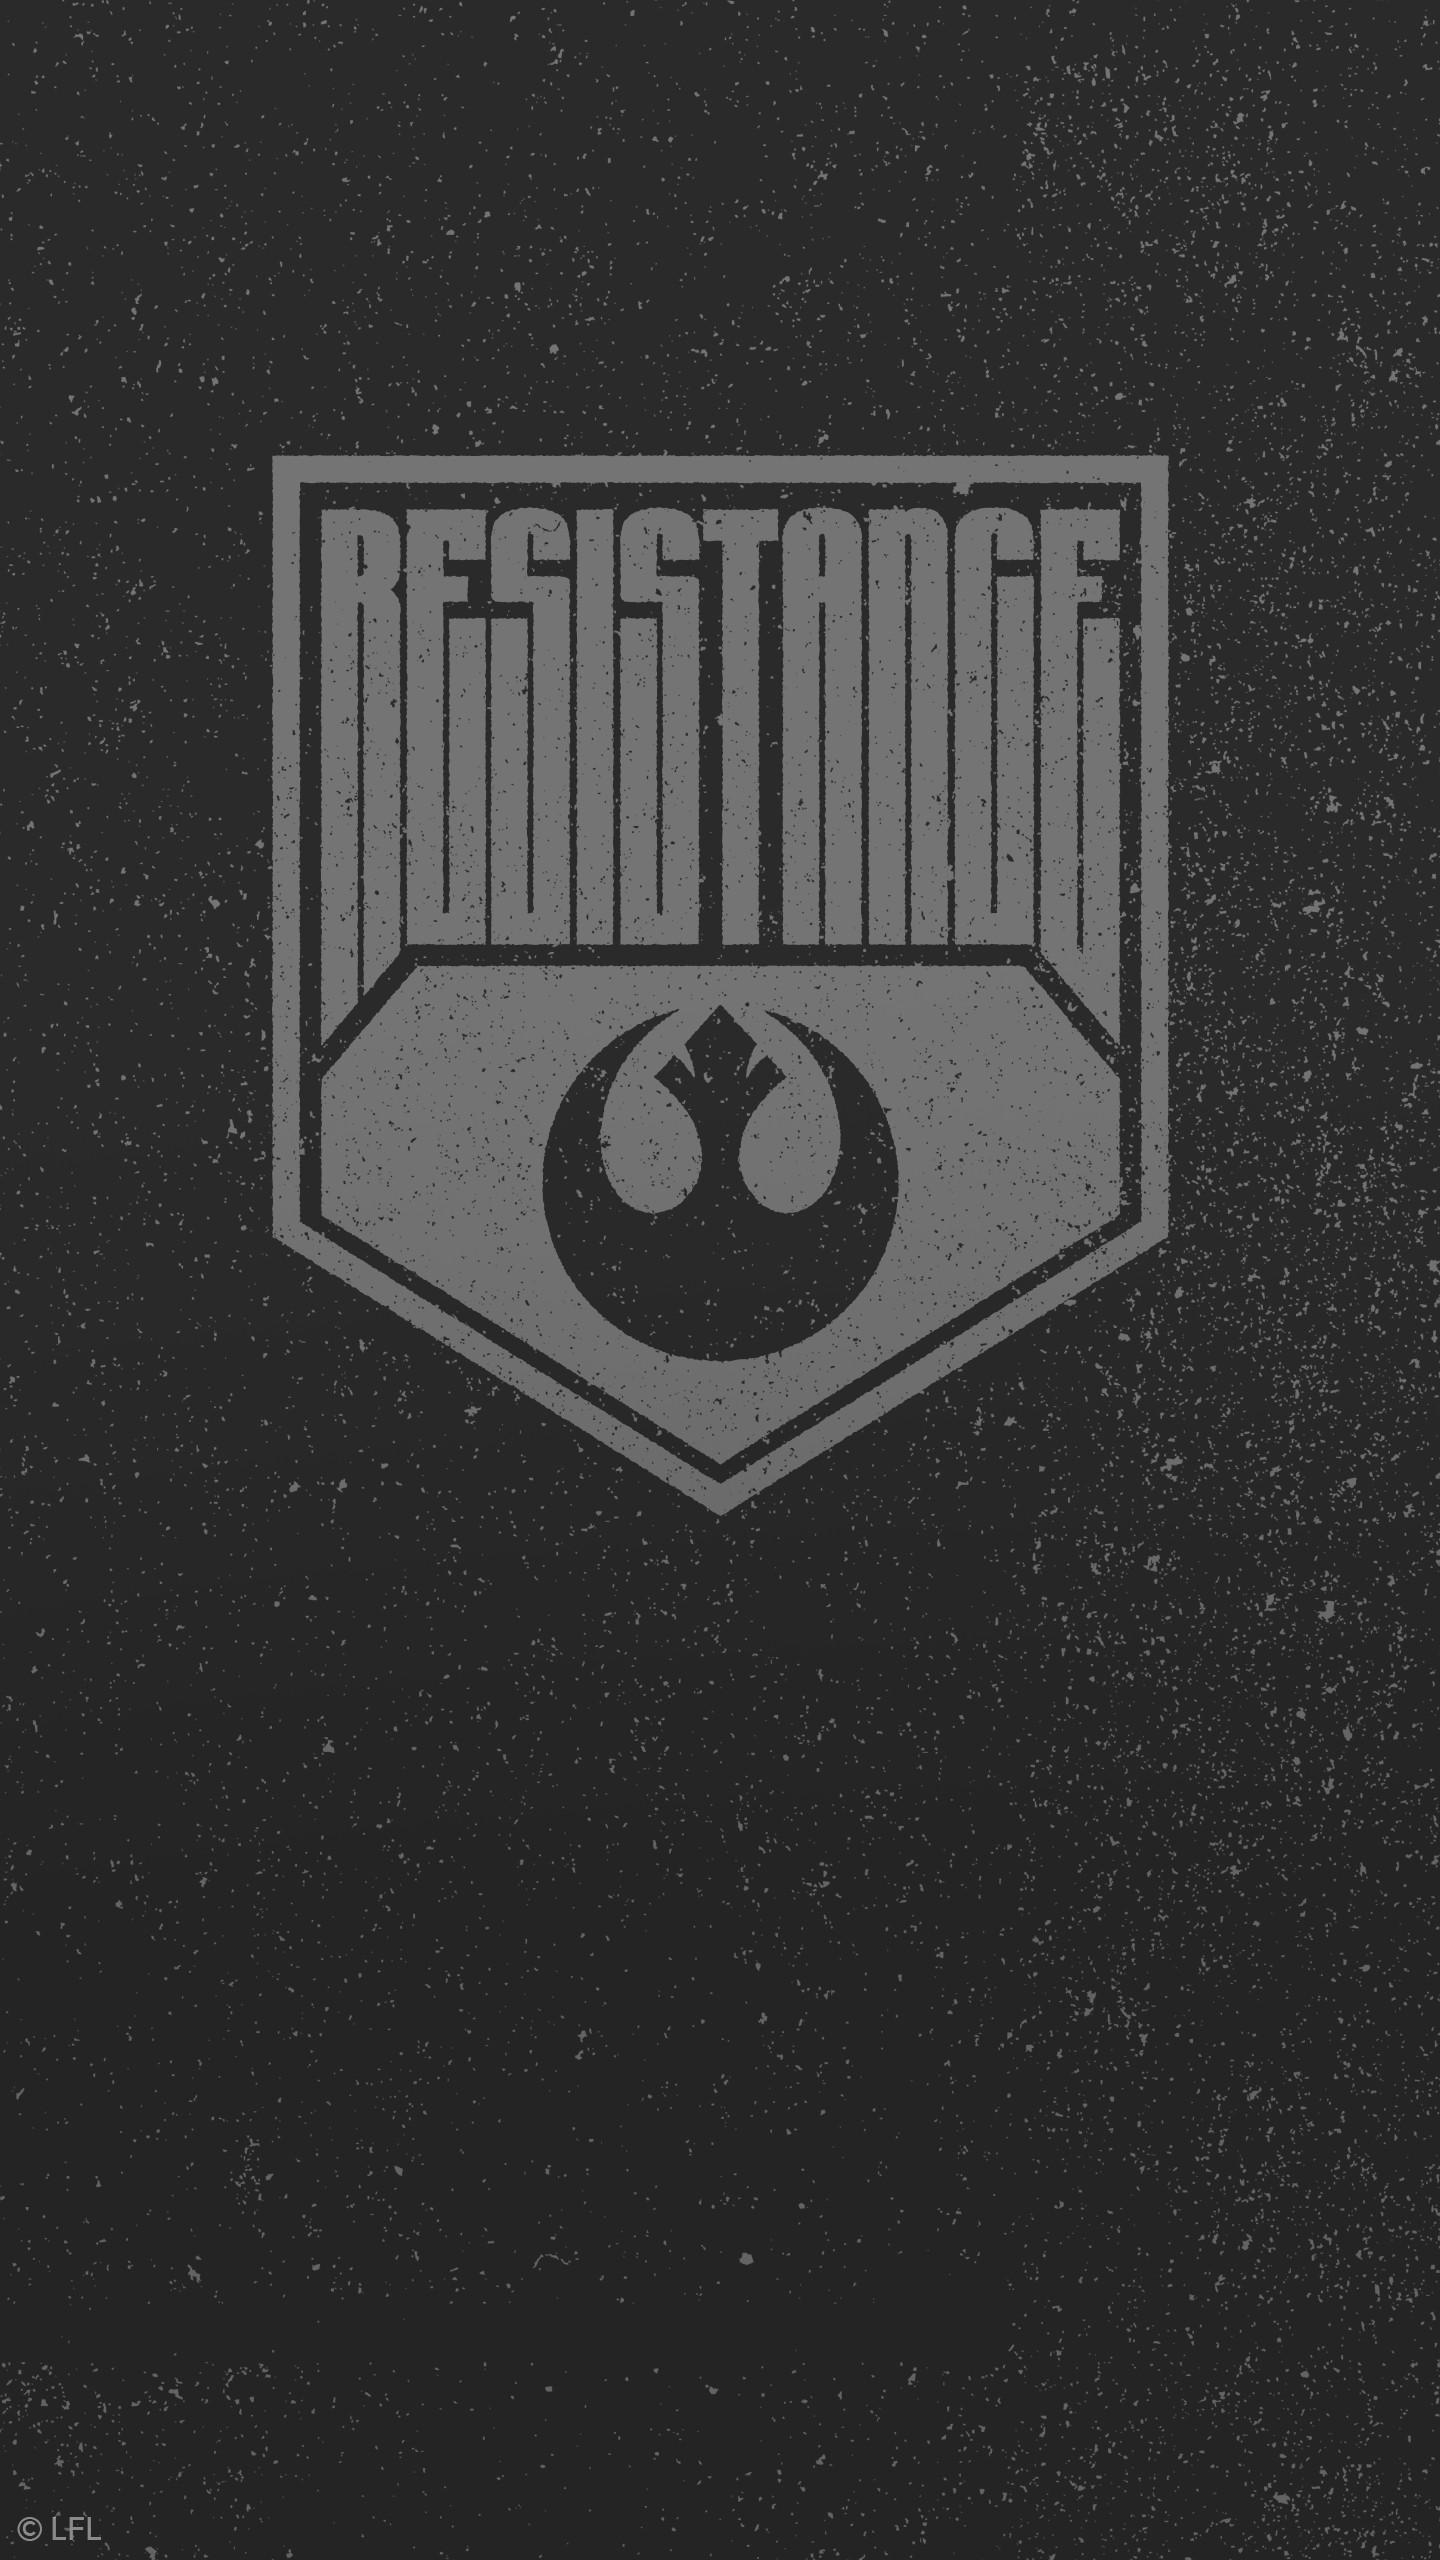 Star Wars Resistance Wallpapers Wallpaper Cave